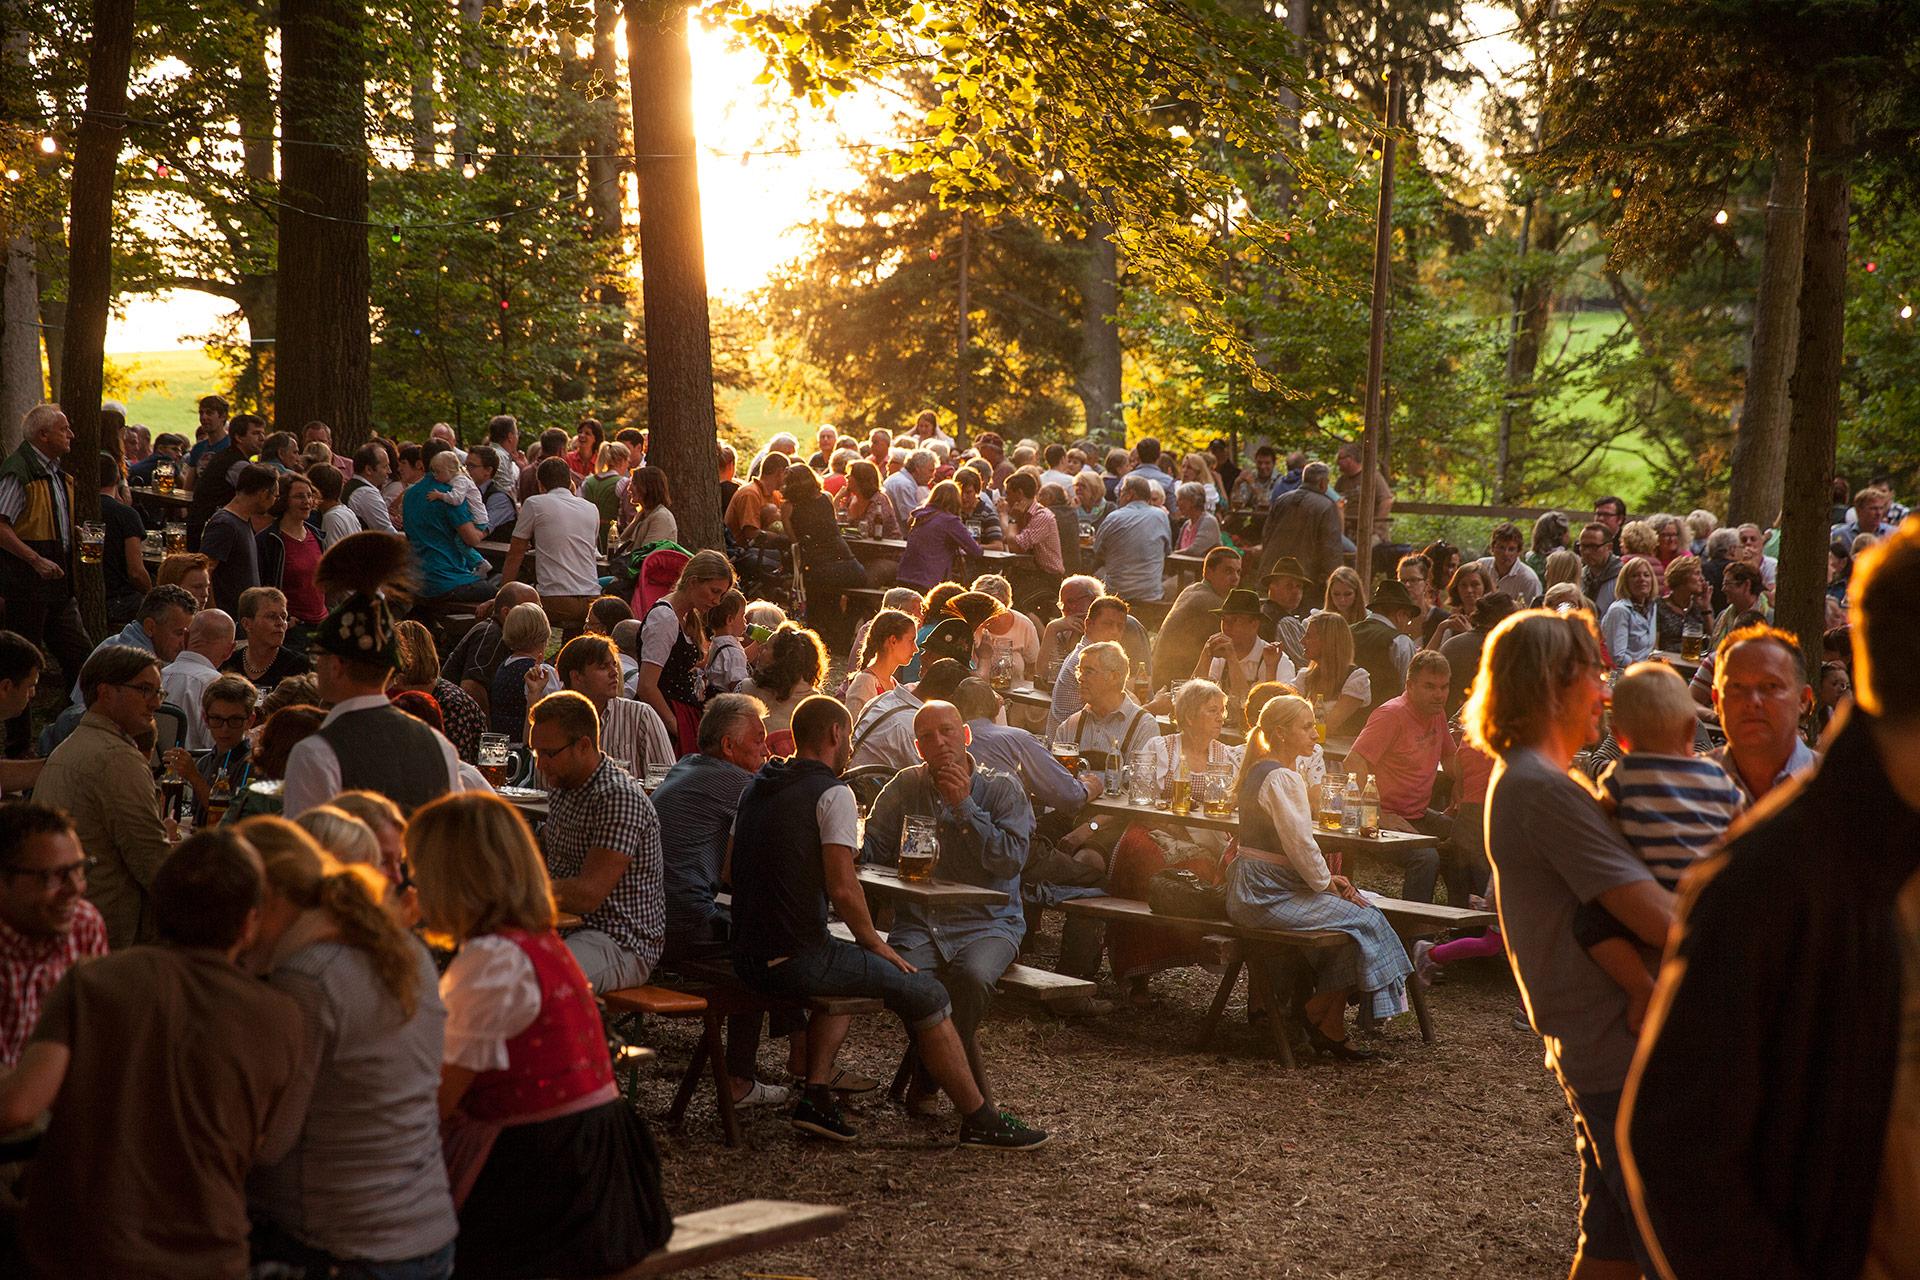 Atmosfera di festa (Foto © Ulli Seer)